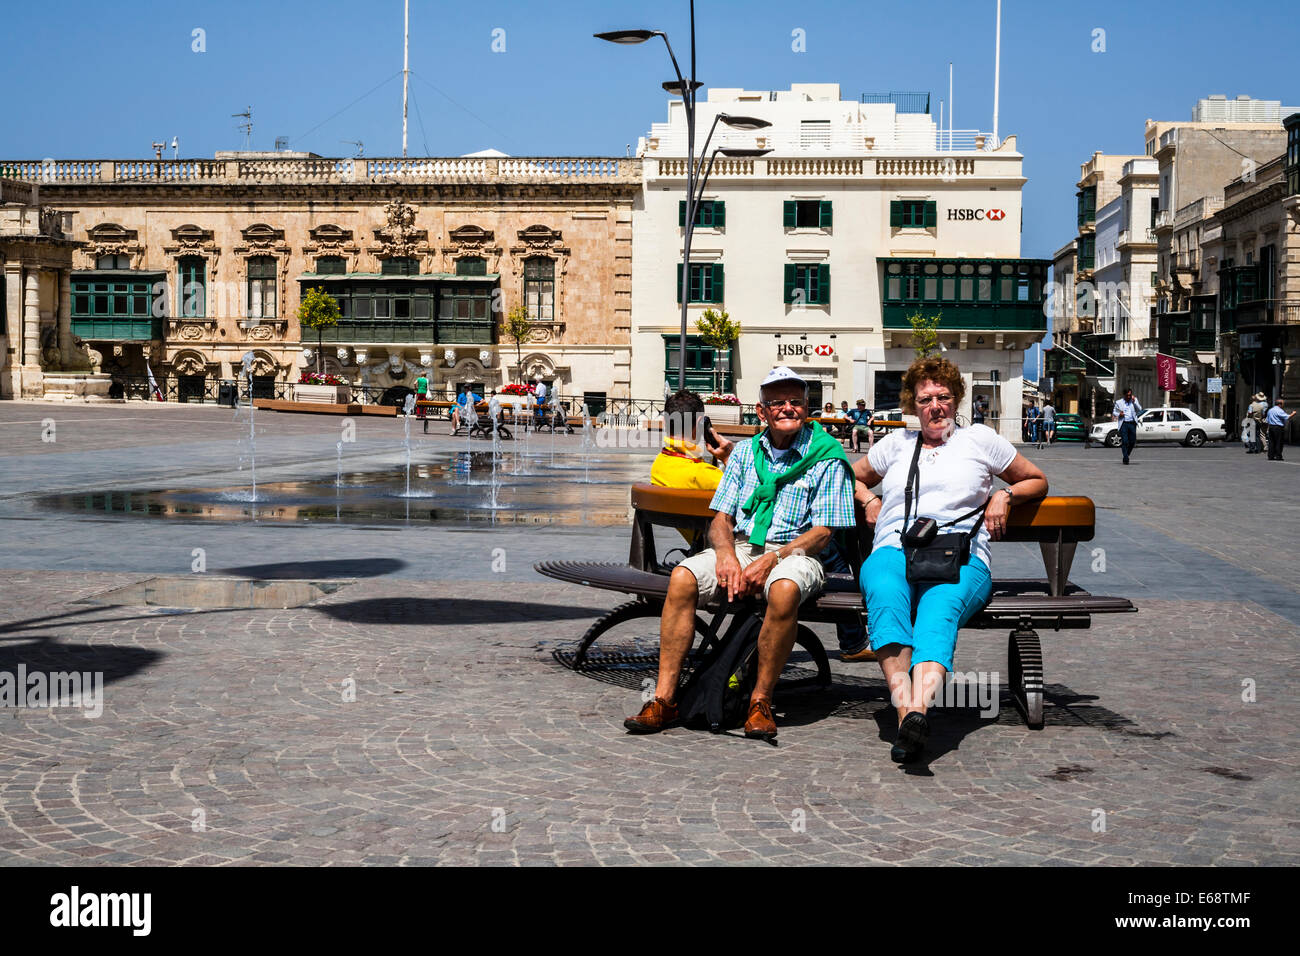 Saint George's Square, Valletta, Malta. - Stock Image